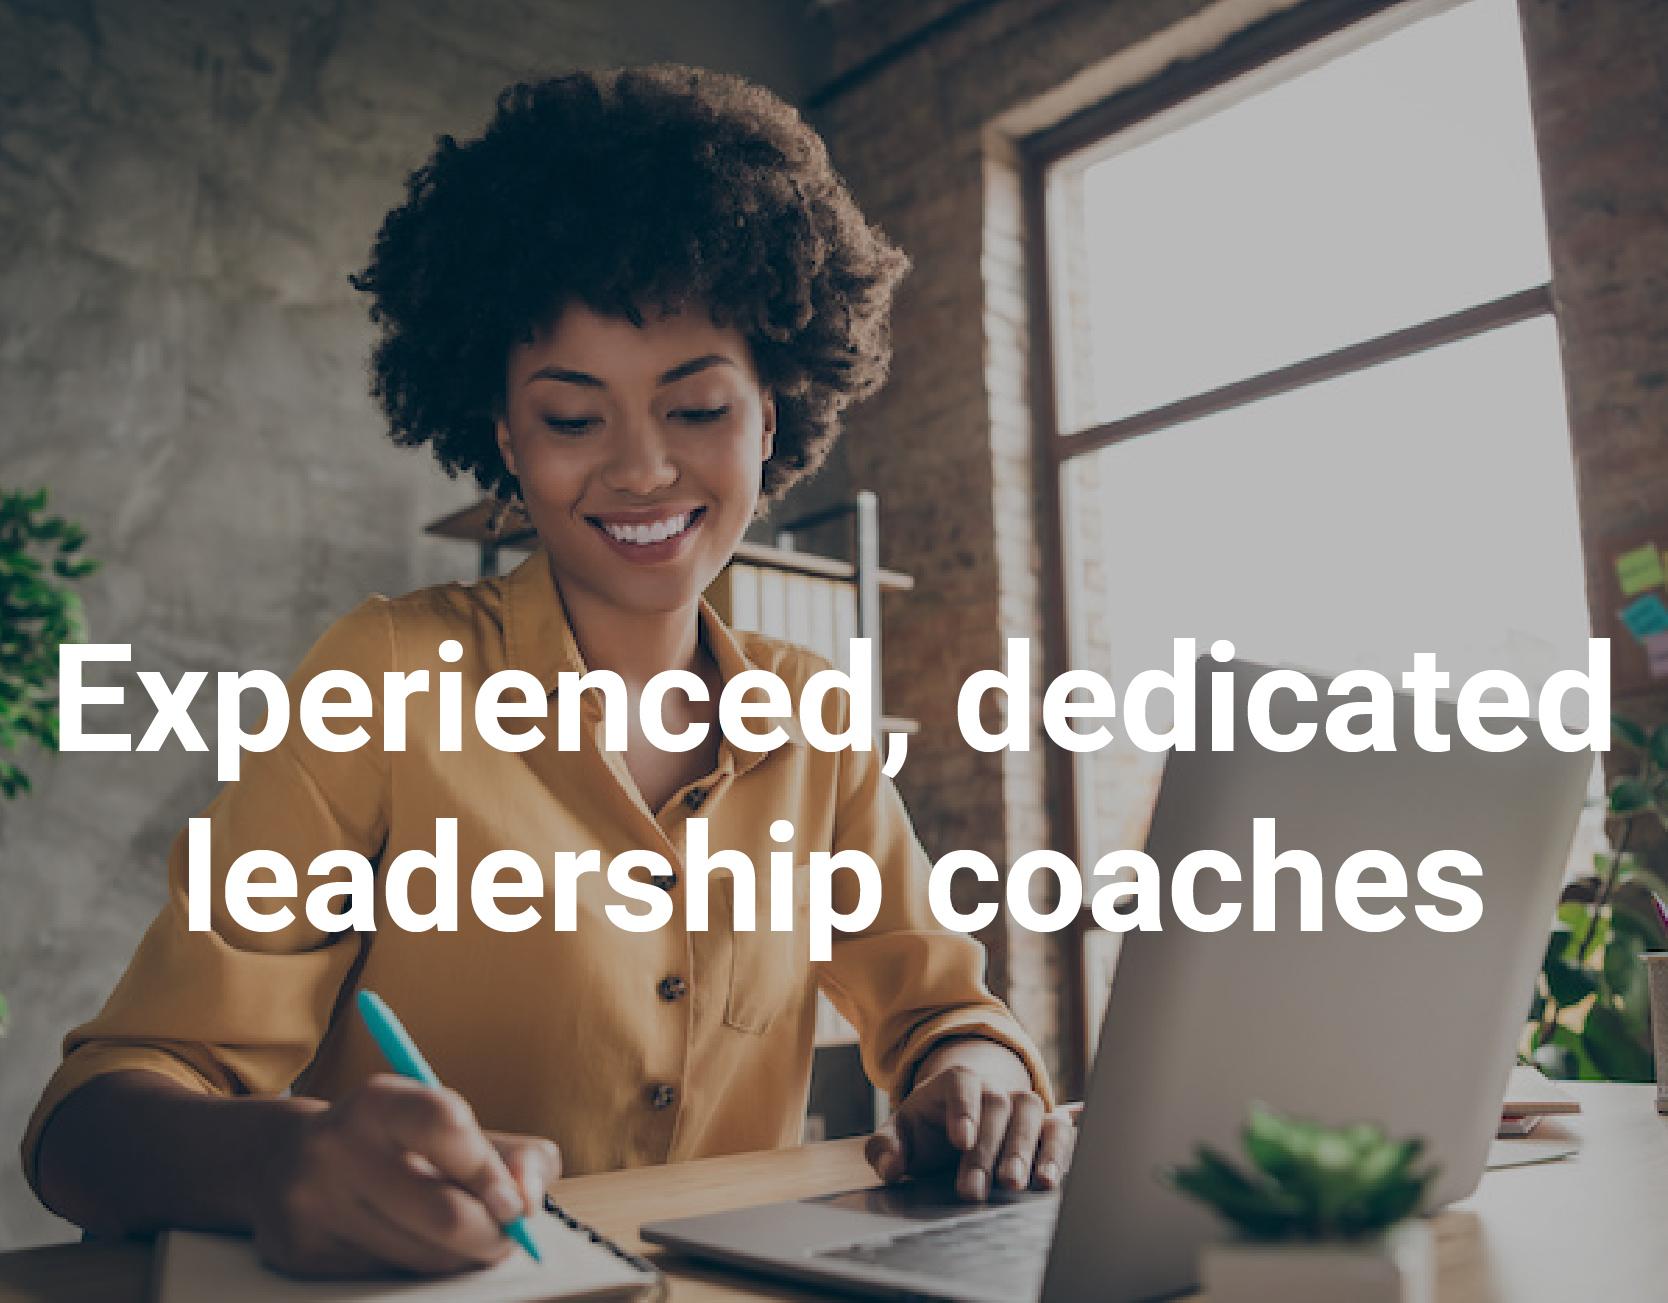 professional coaching image